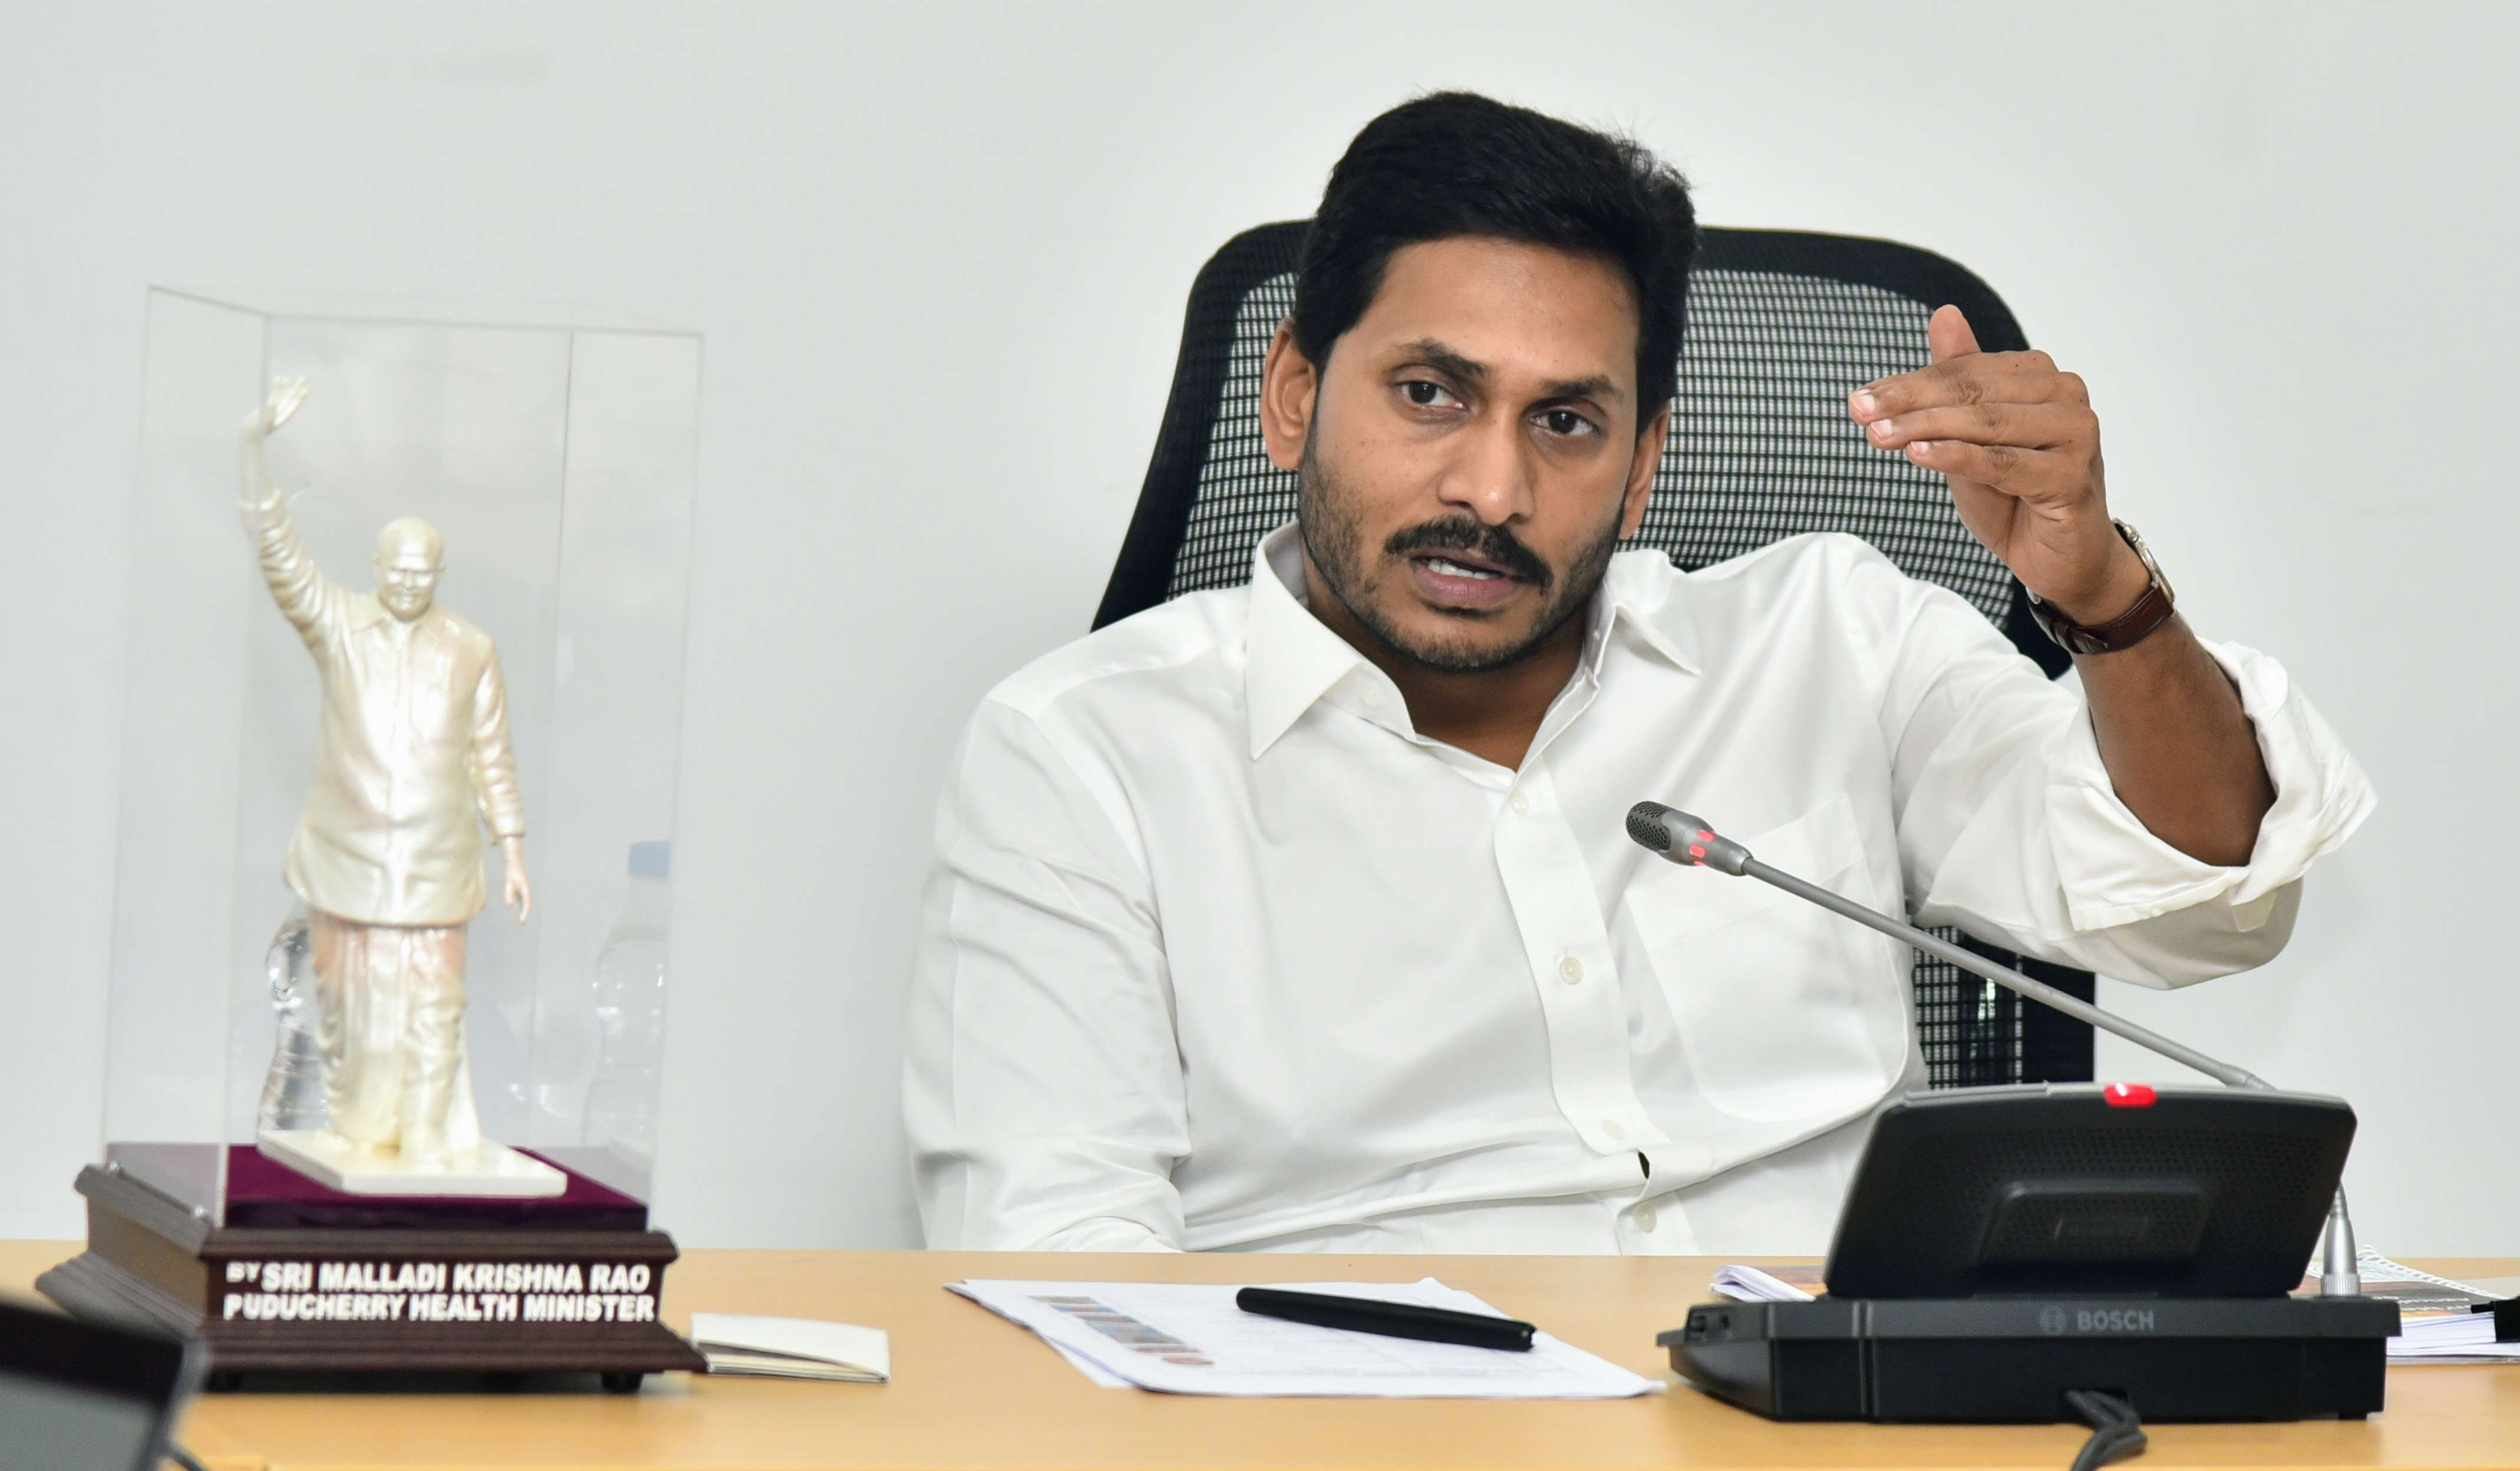 Andhra Pradesh CM Jagan Mohan Reddy hails Telangana CM for Hyderabad encounter